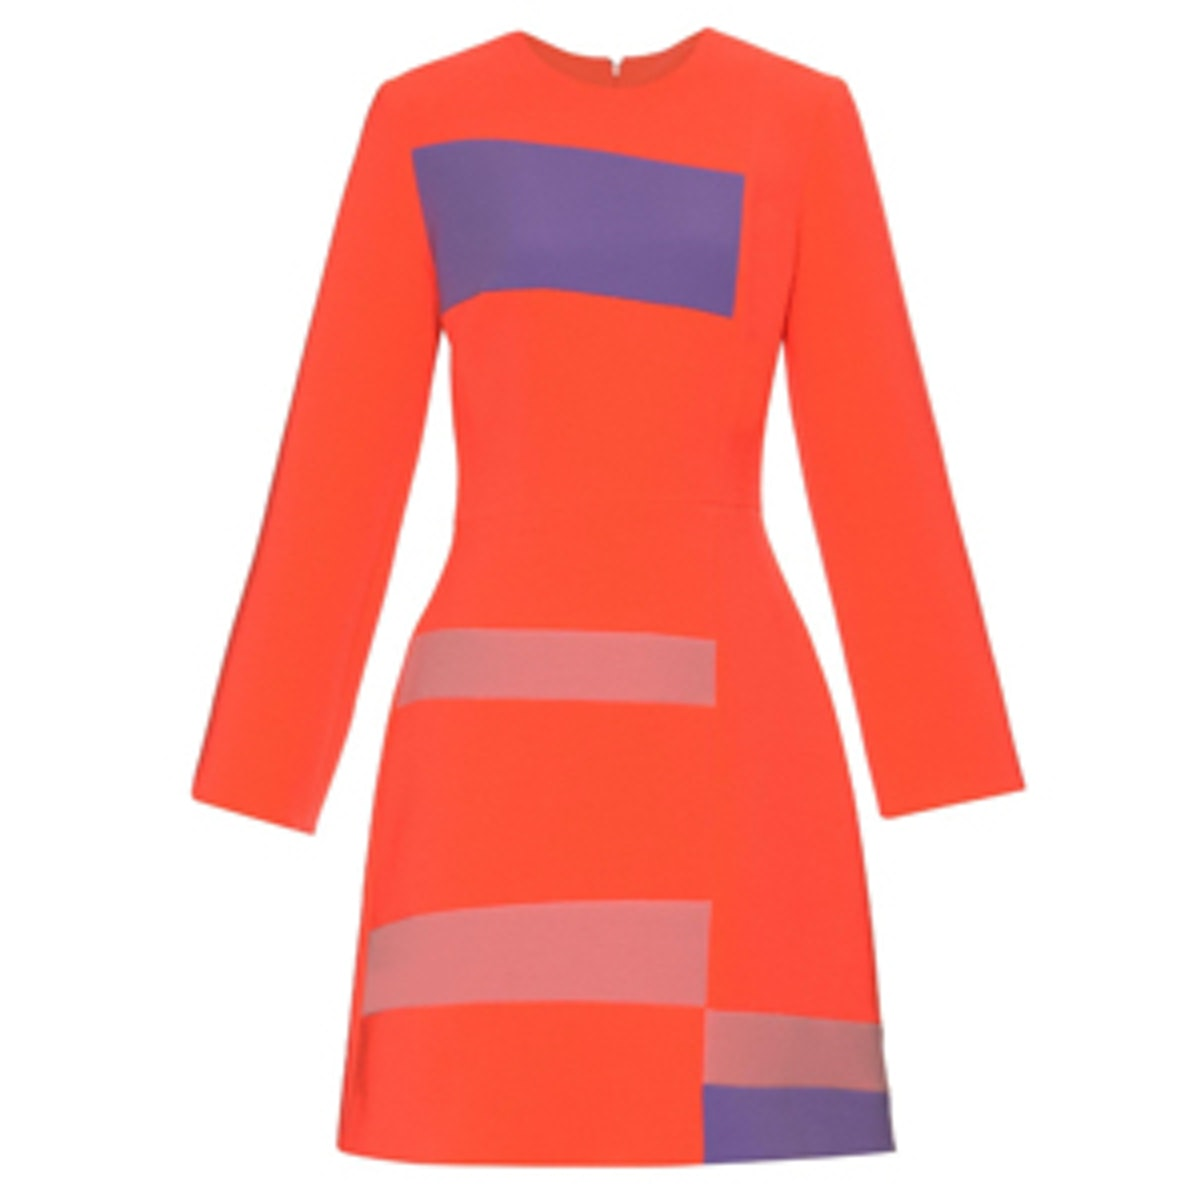 Albin Long-Sleeved Cady Dress